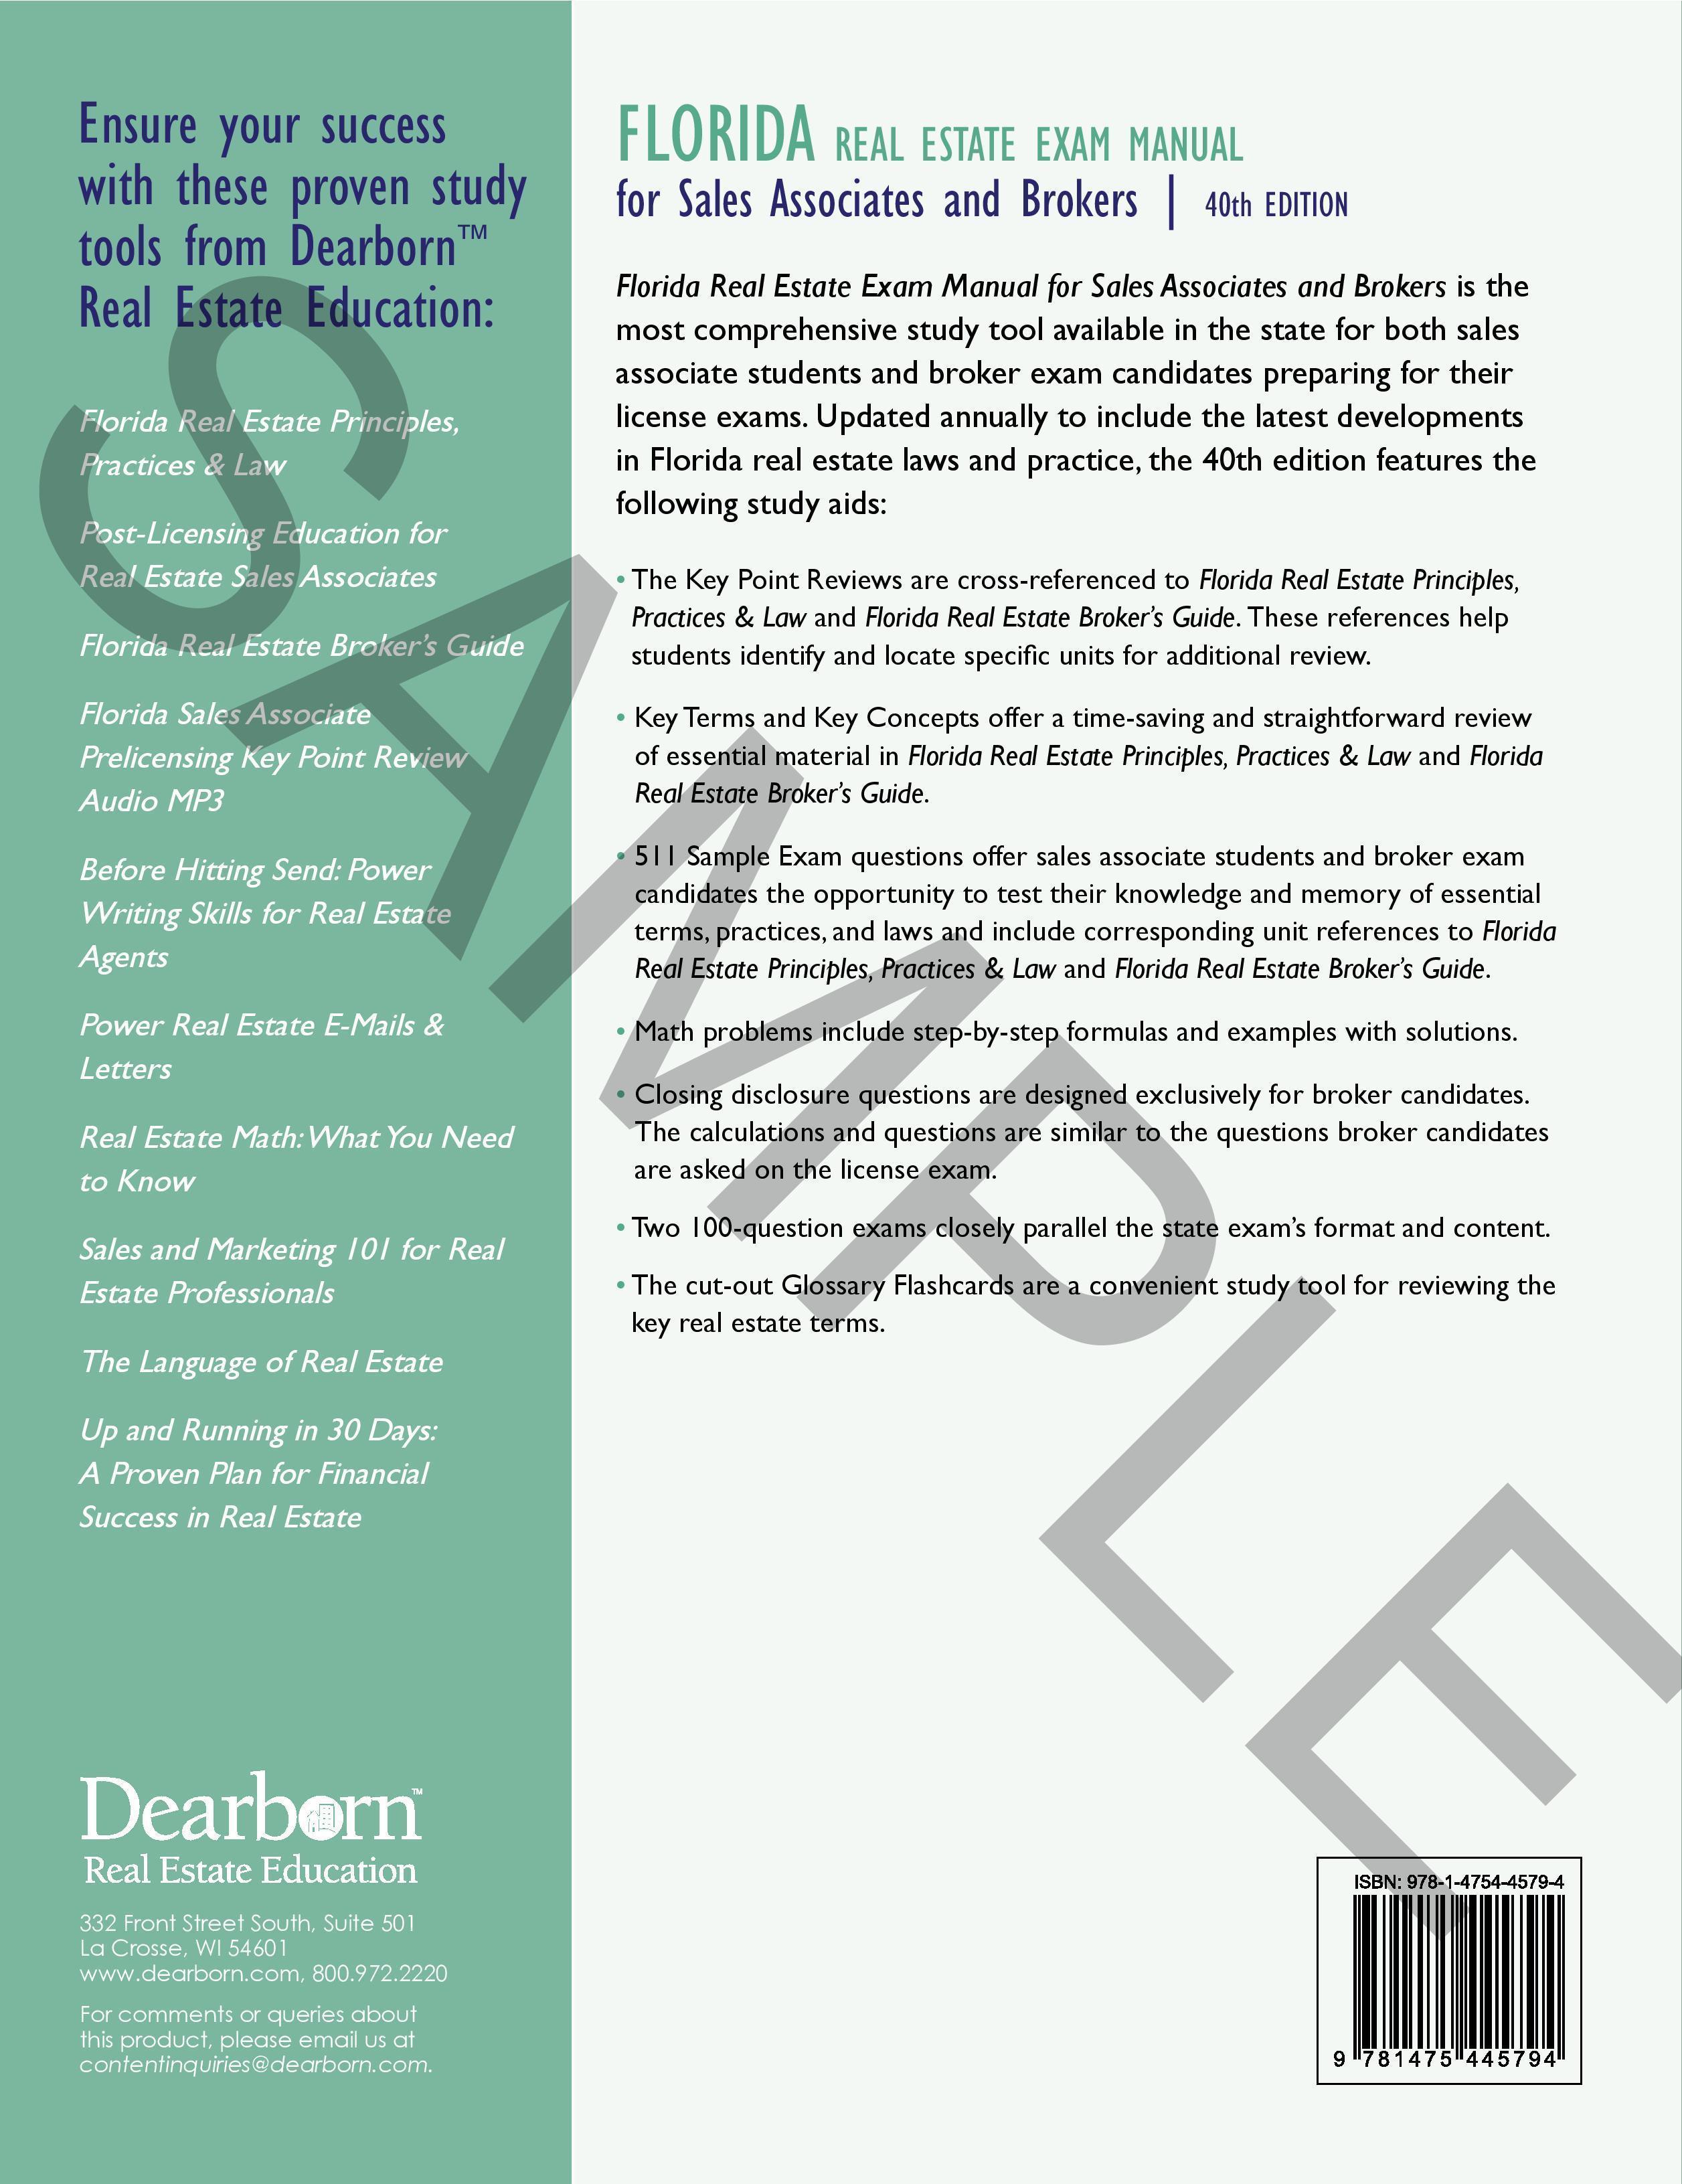 florida real estate exam manual 41st edition rh tampaschoolofrealestate com